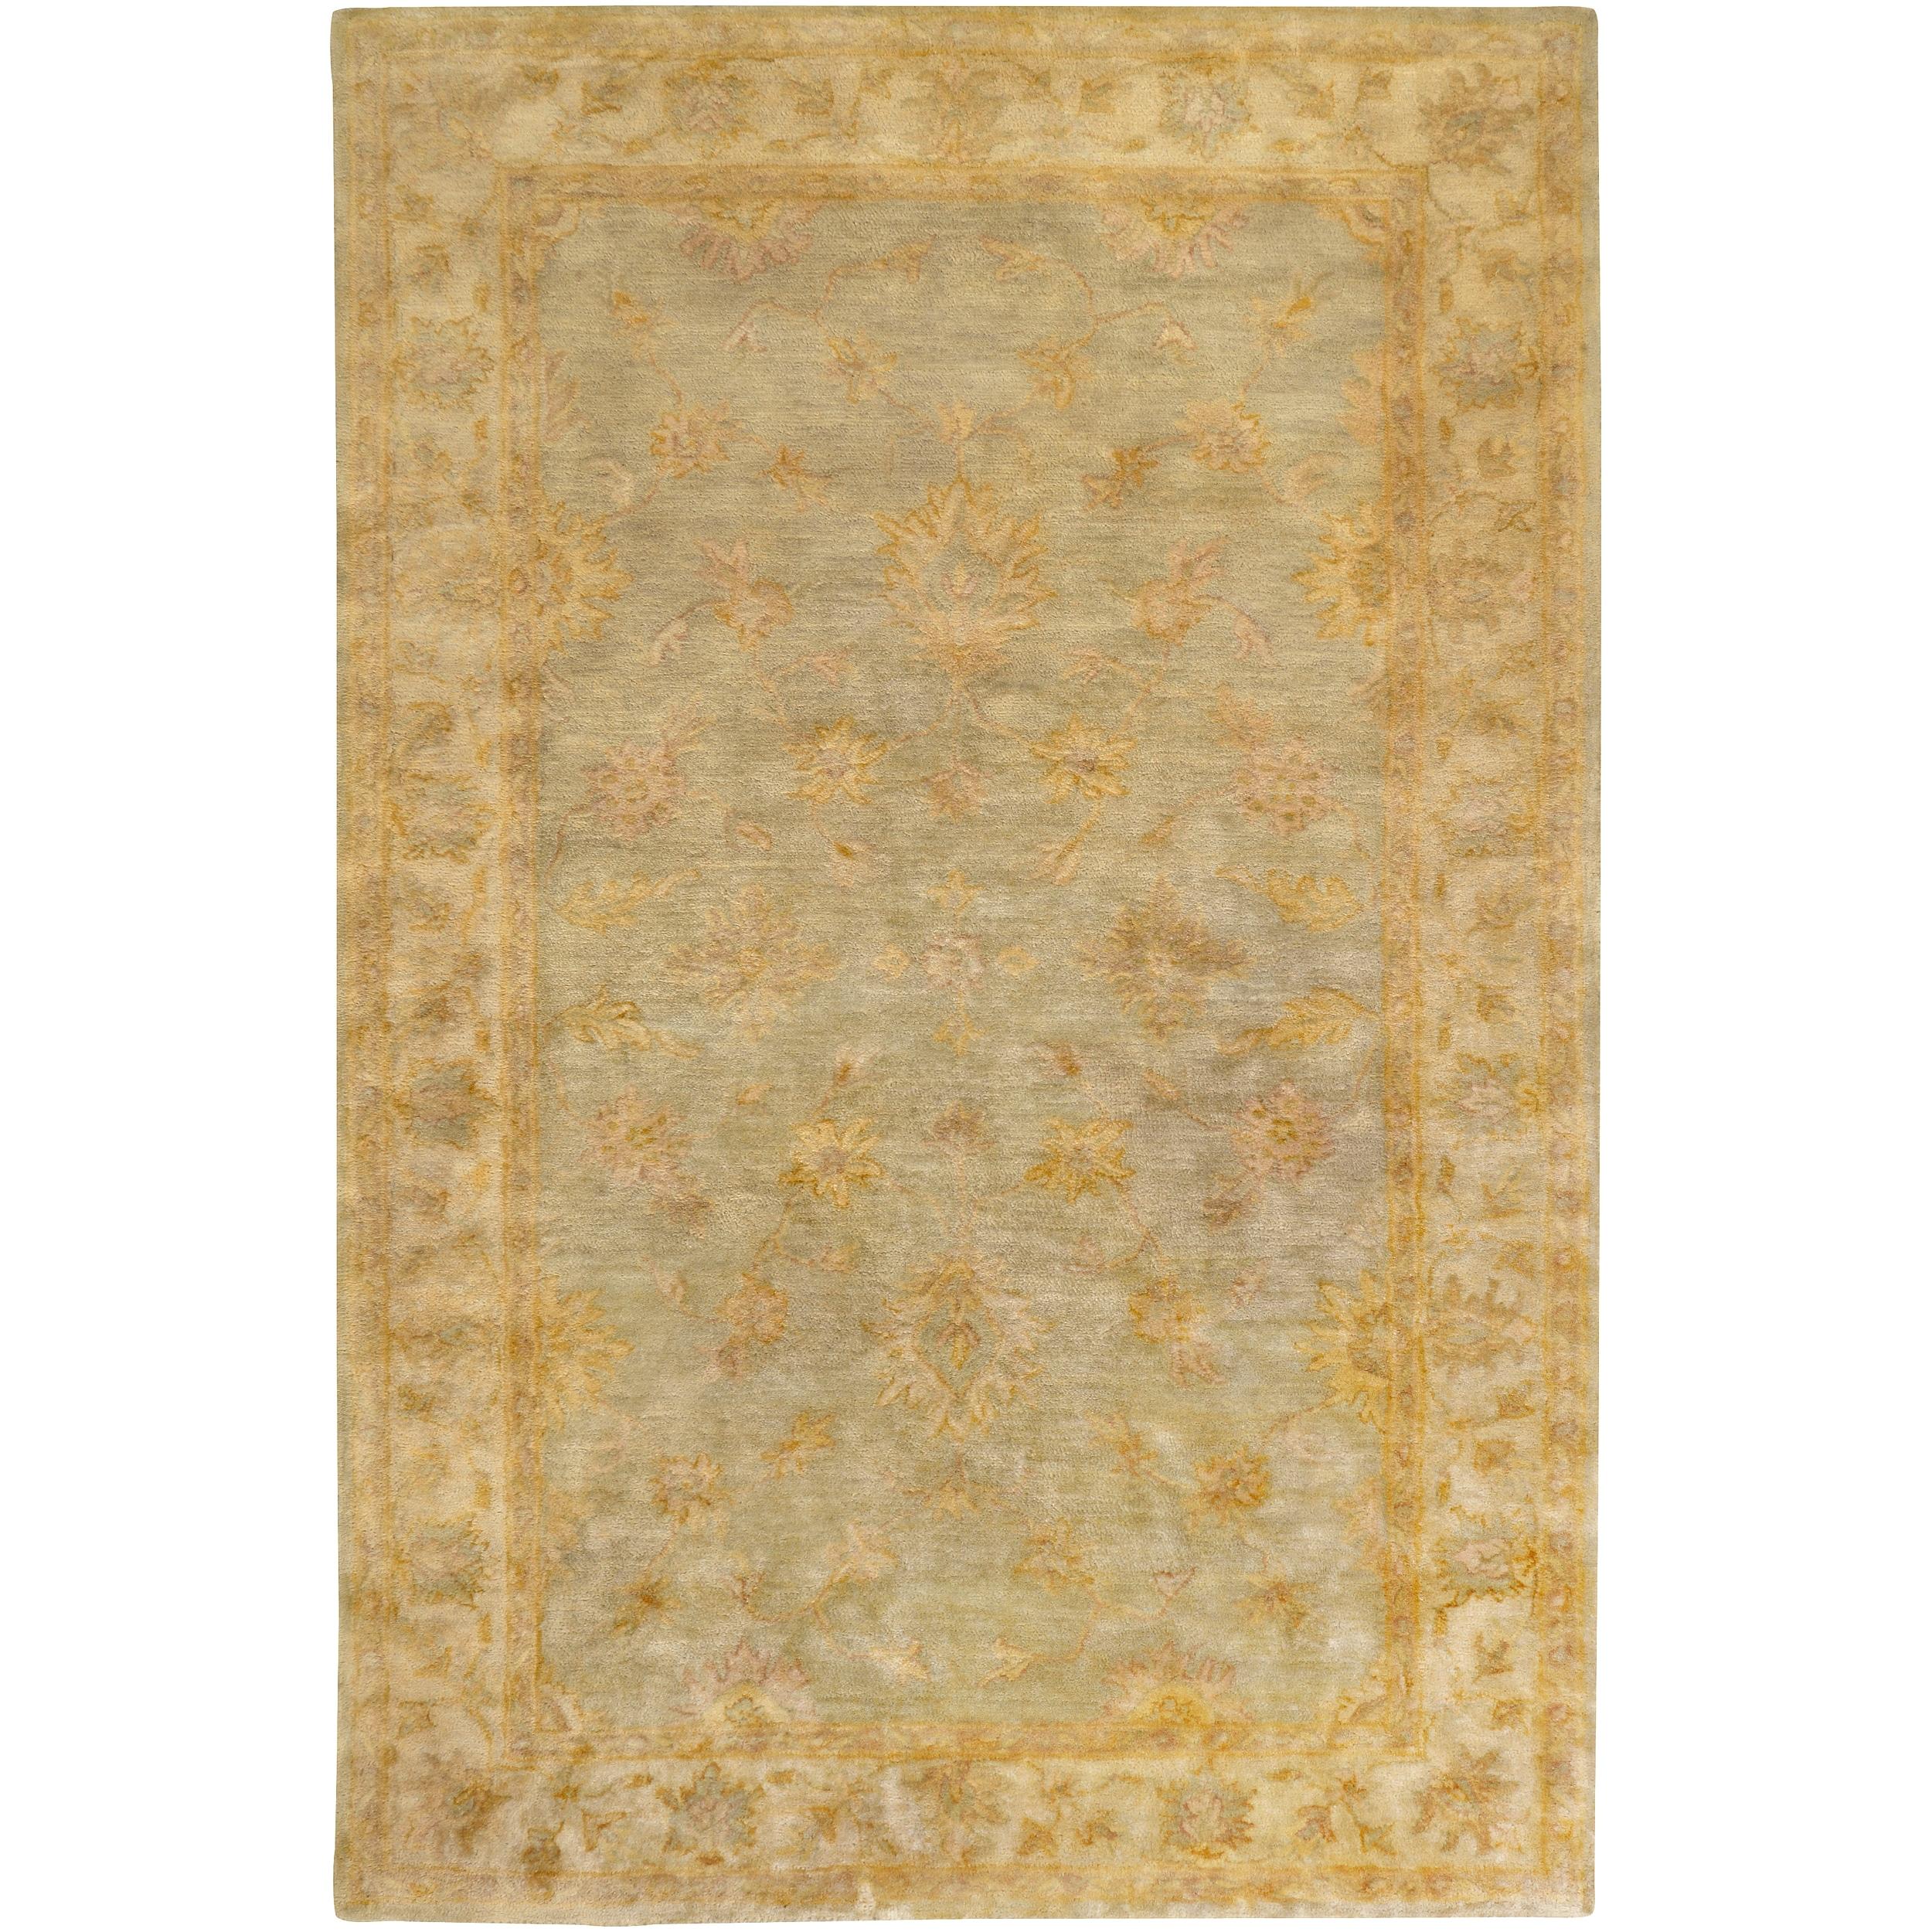 Hand-tufted Gray Vertigo New Zealand Wool Rug (8' x 11')